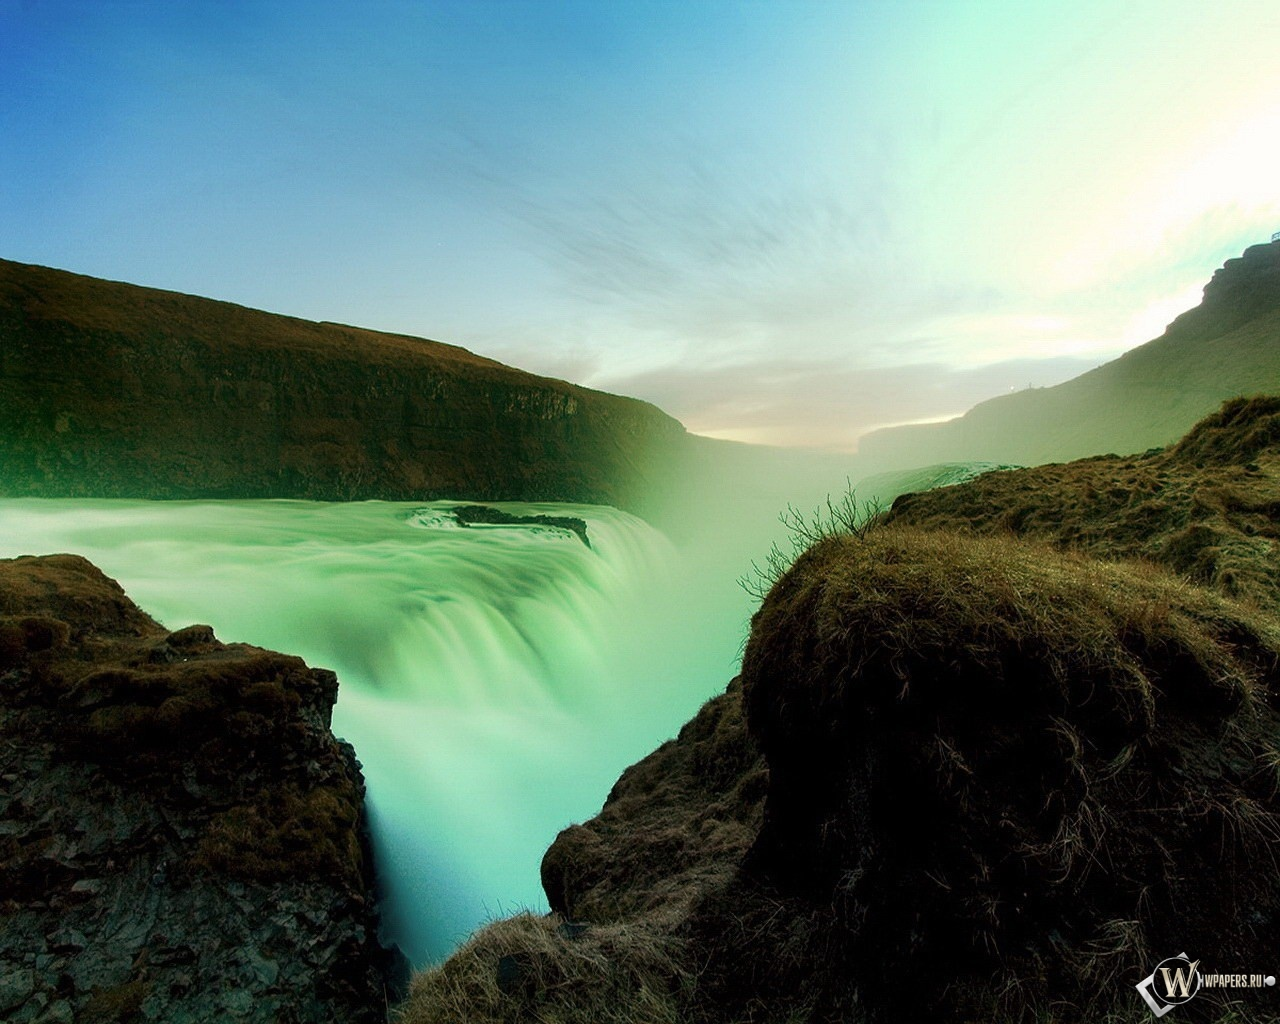 Лазурный водопад 1280x1024